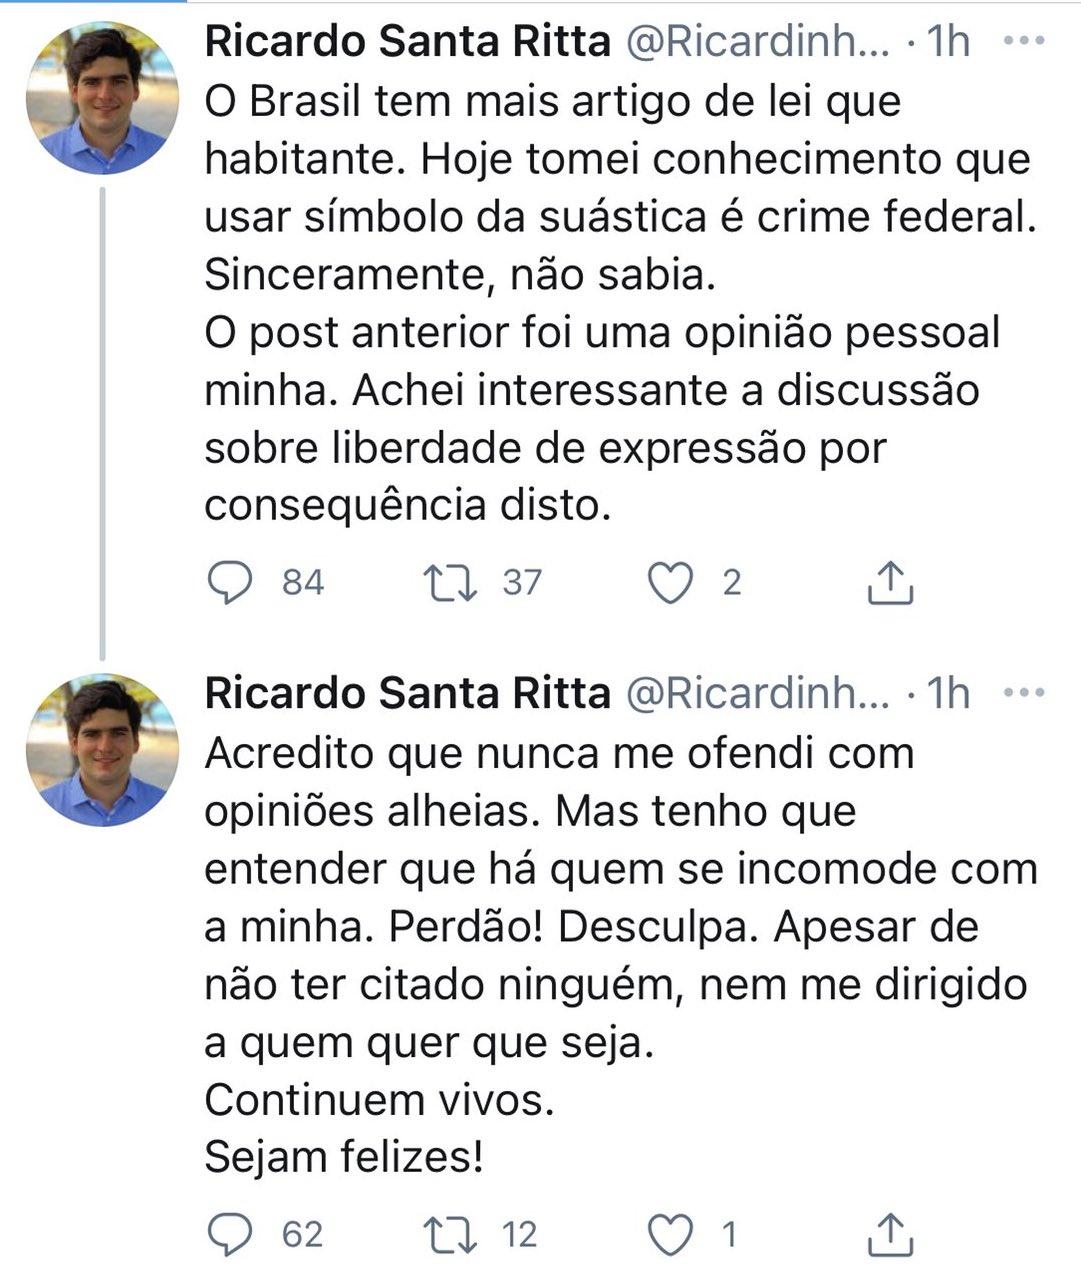 Ricardo Maceio 1